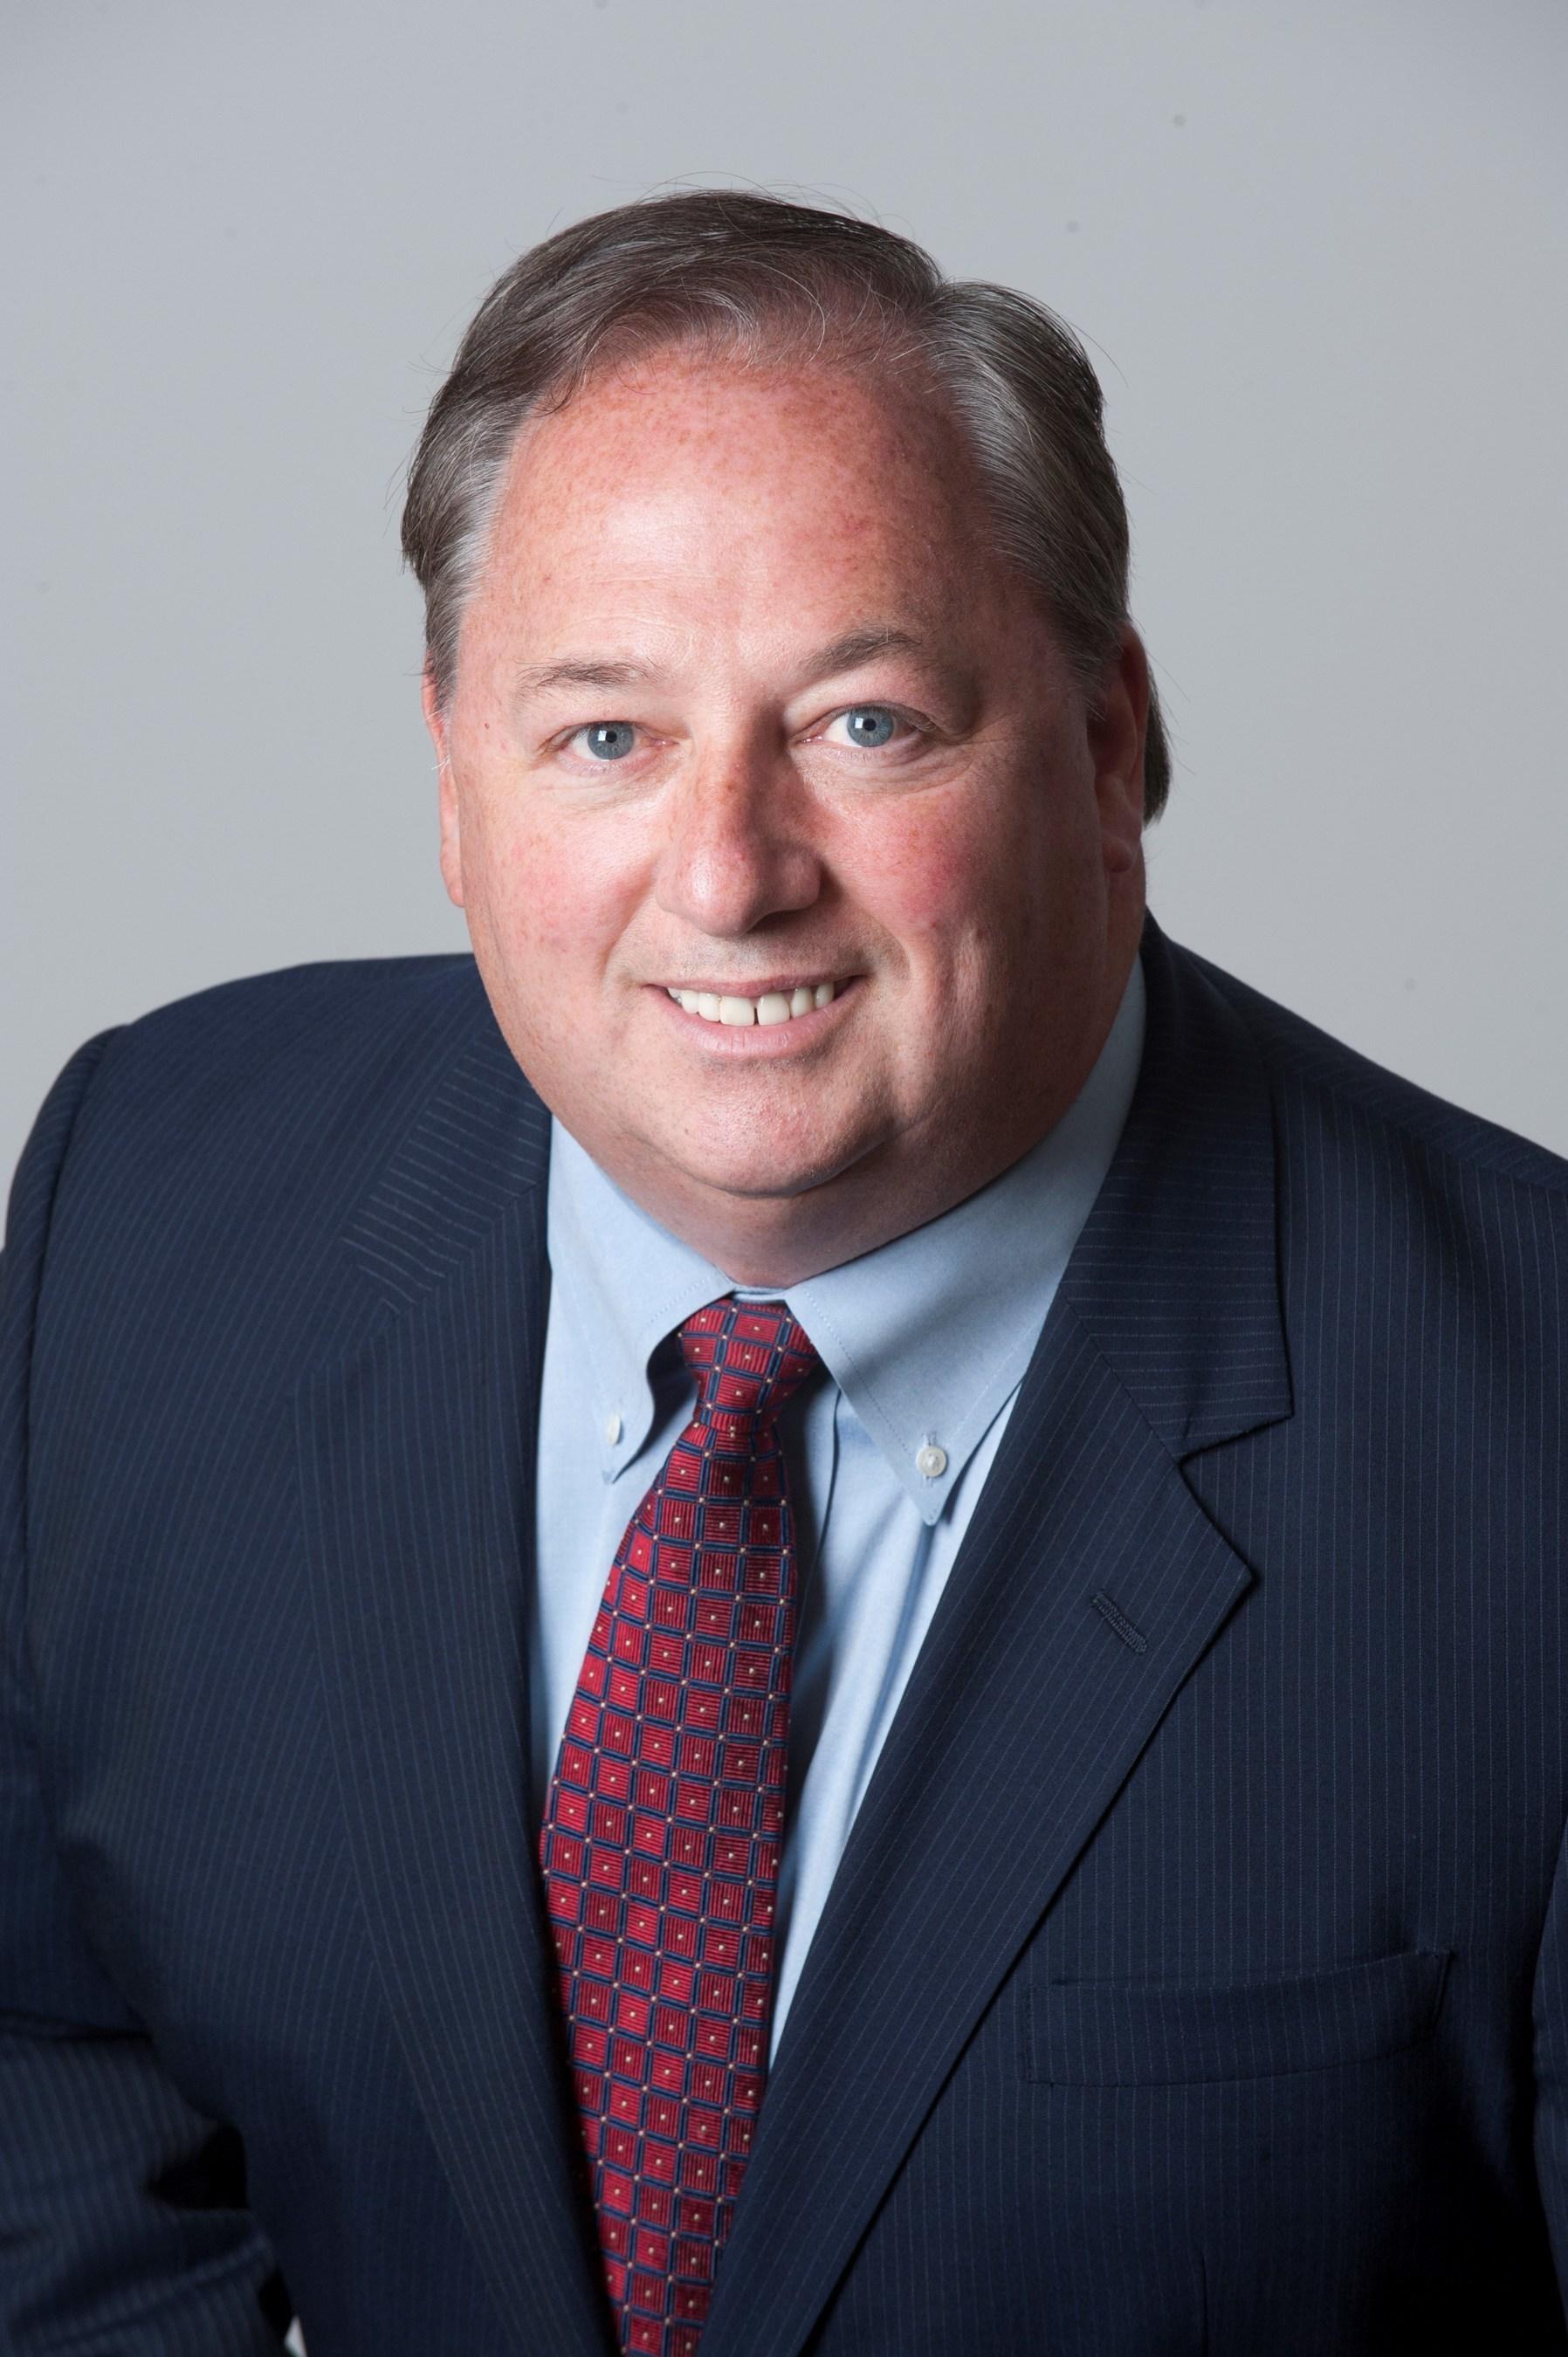 Tom Donatacci Joins Selene Finance November 30 as Executive Vice President of Business Development